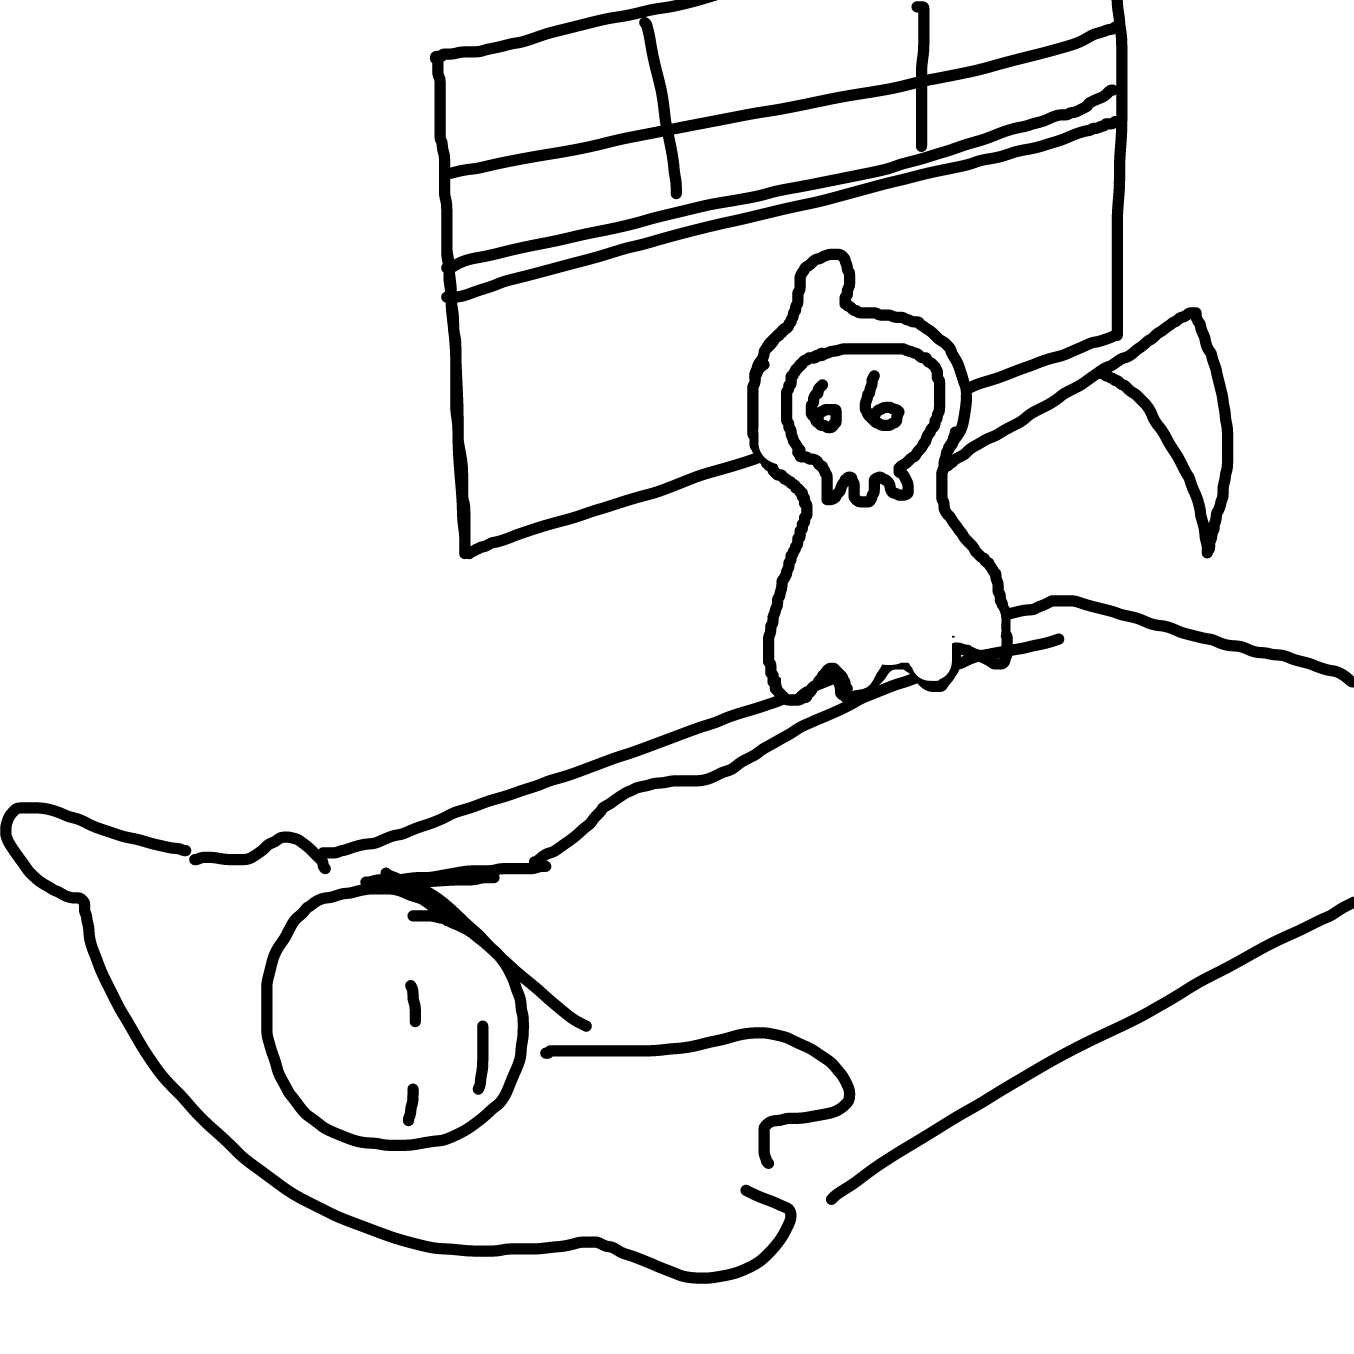 Drawing in Li'l Reaper 2: While U Sleep I Reap by TFD